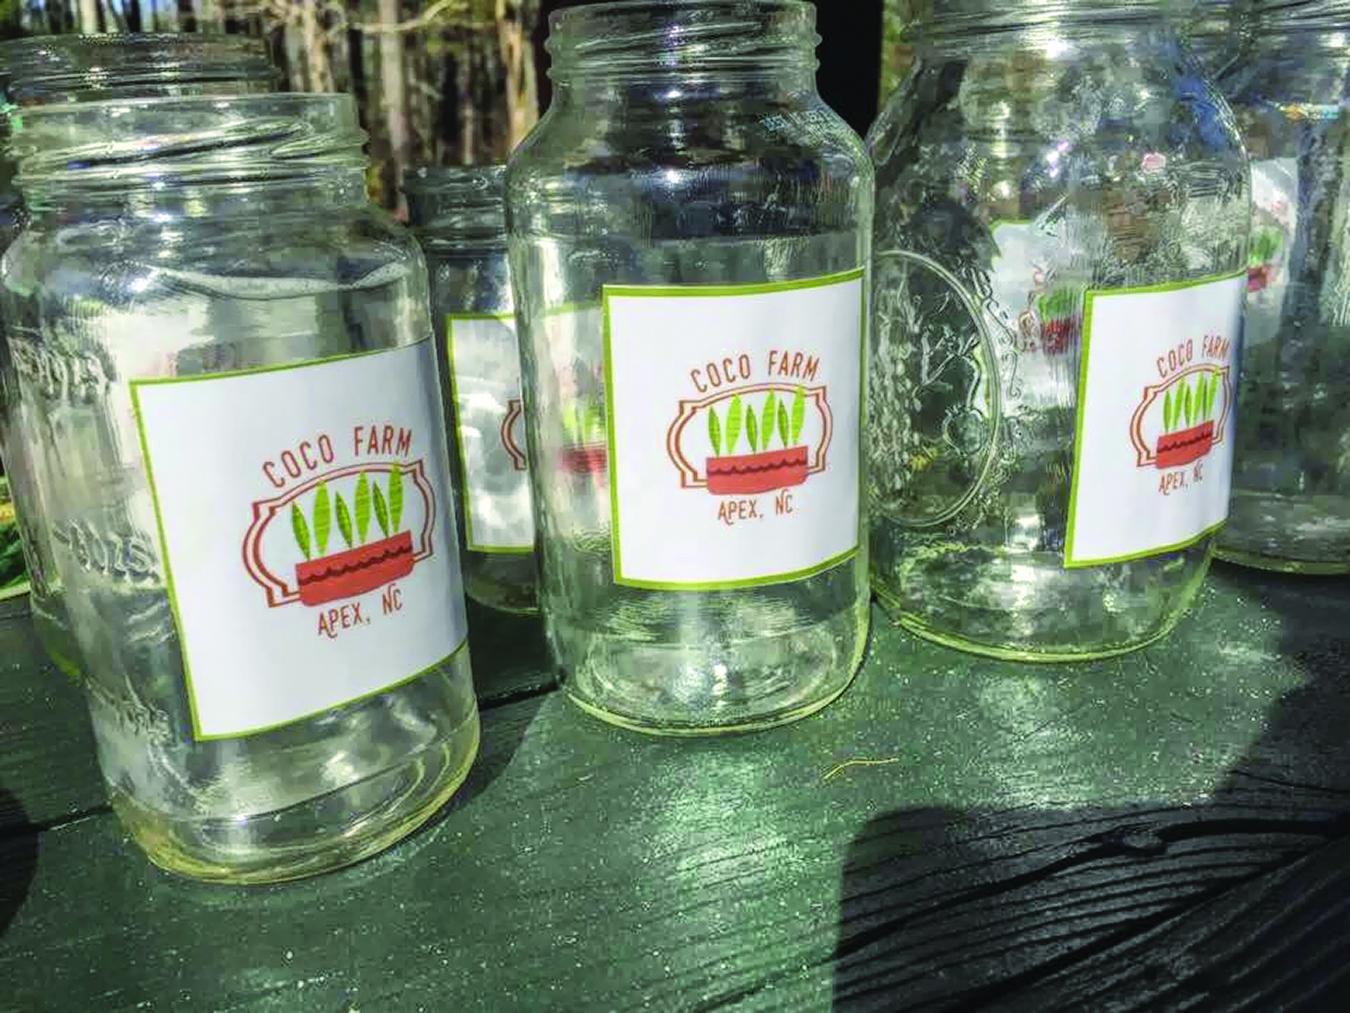 Coco FARM U2013 Bringing The Basics Of Backyard Farming To Apex By Amy Iori